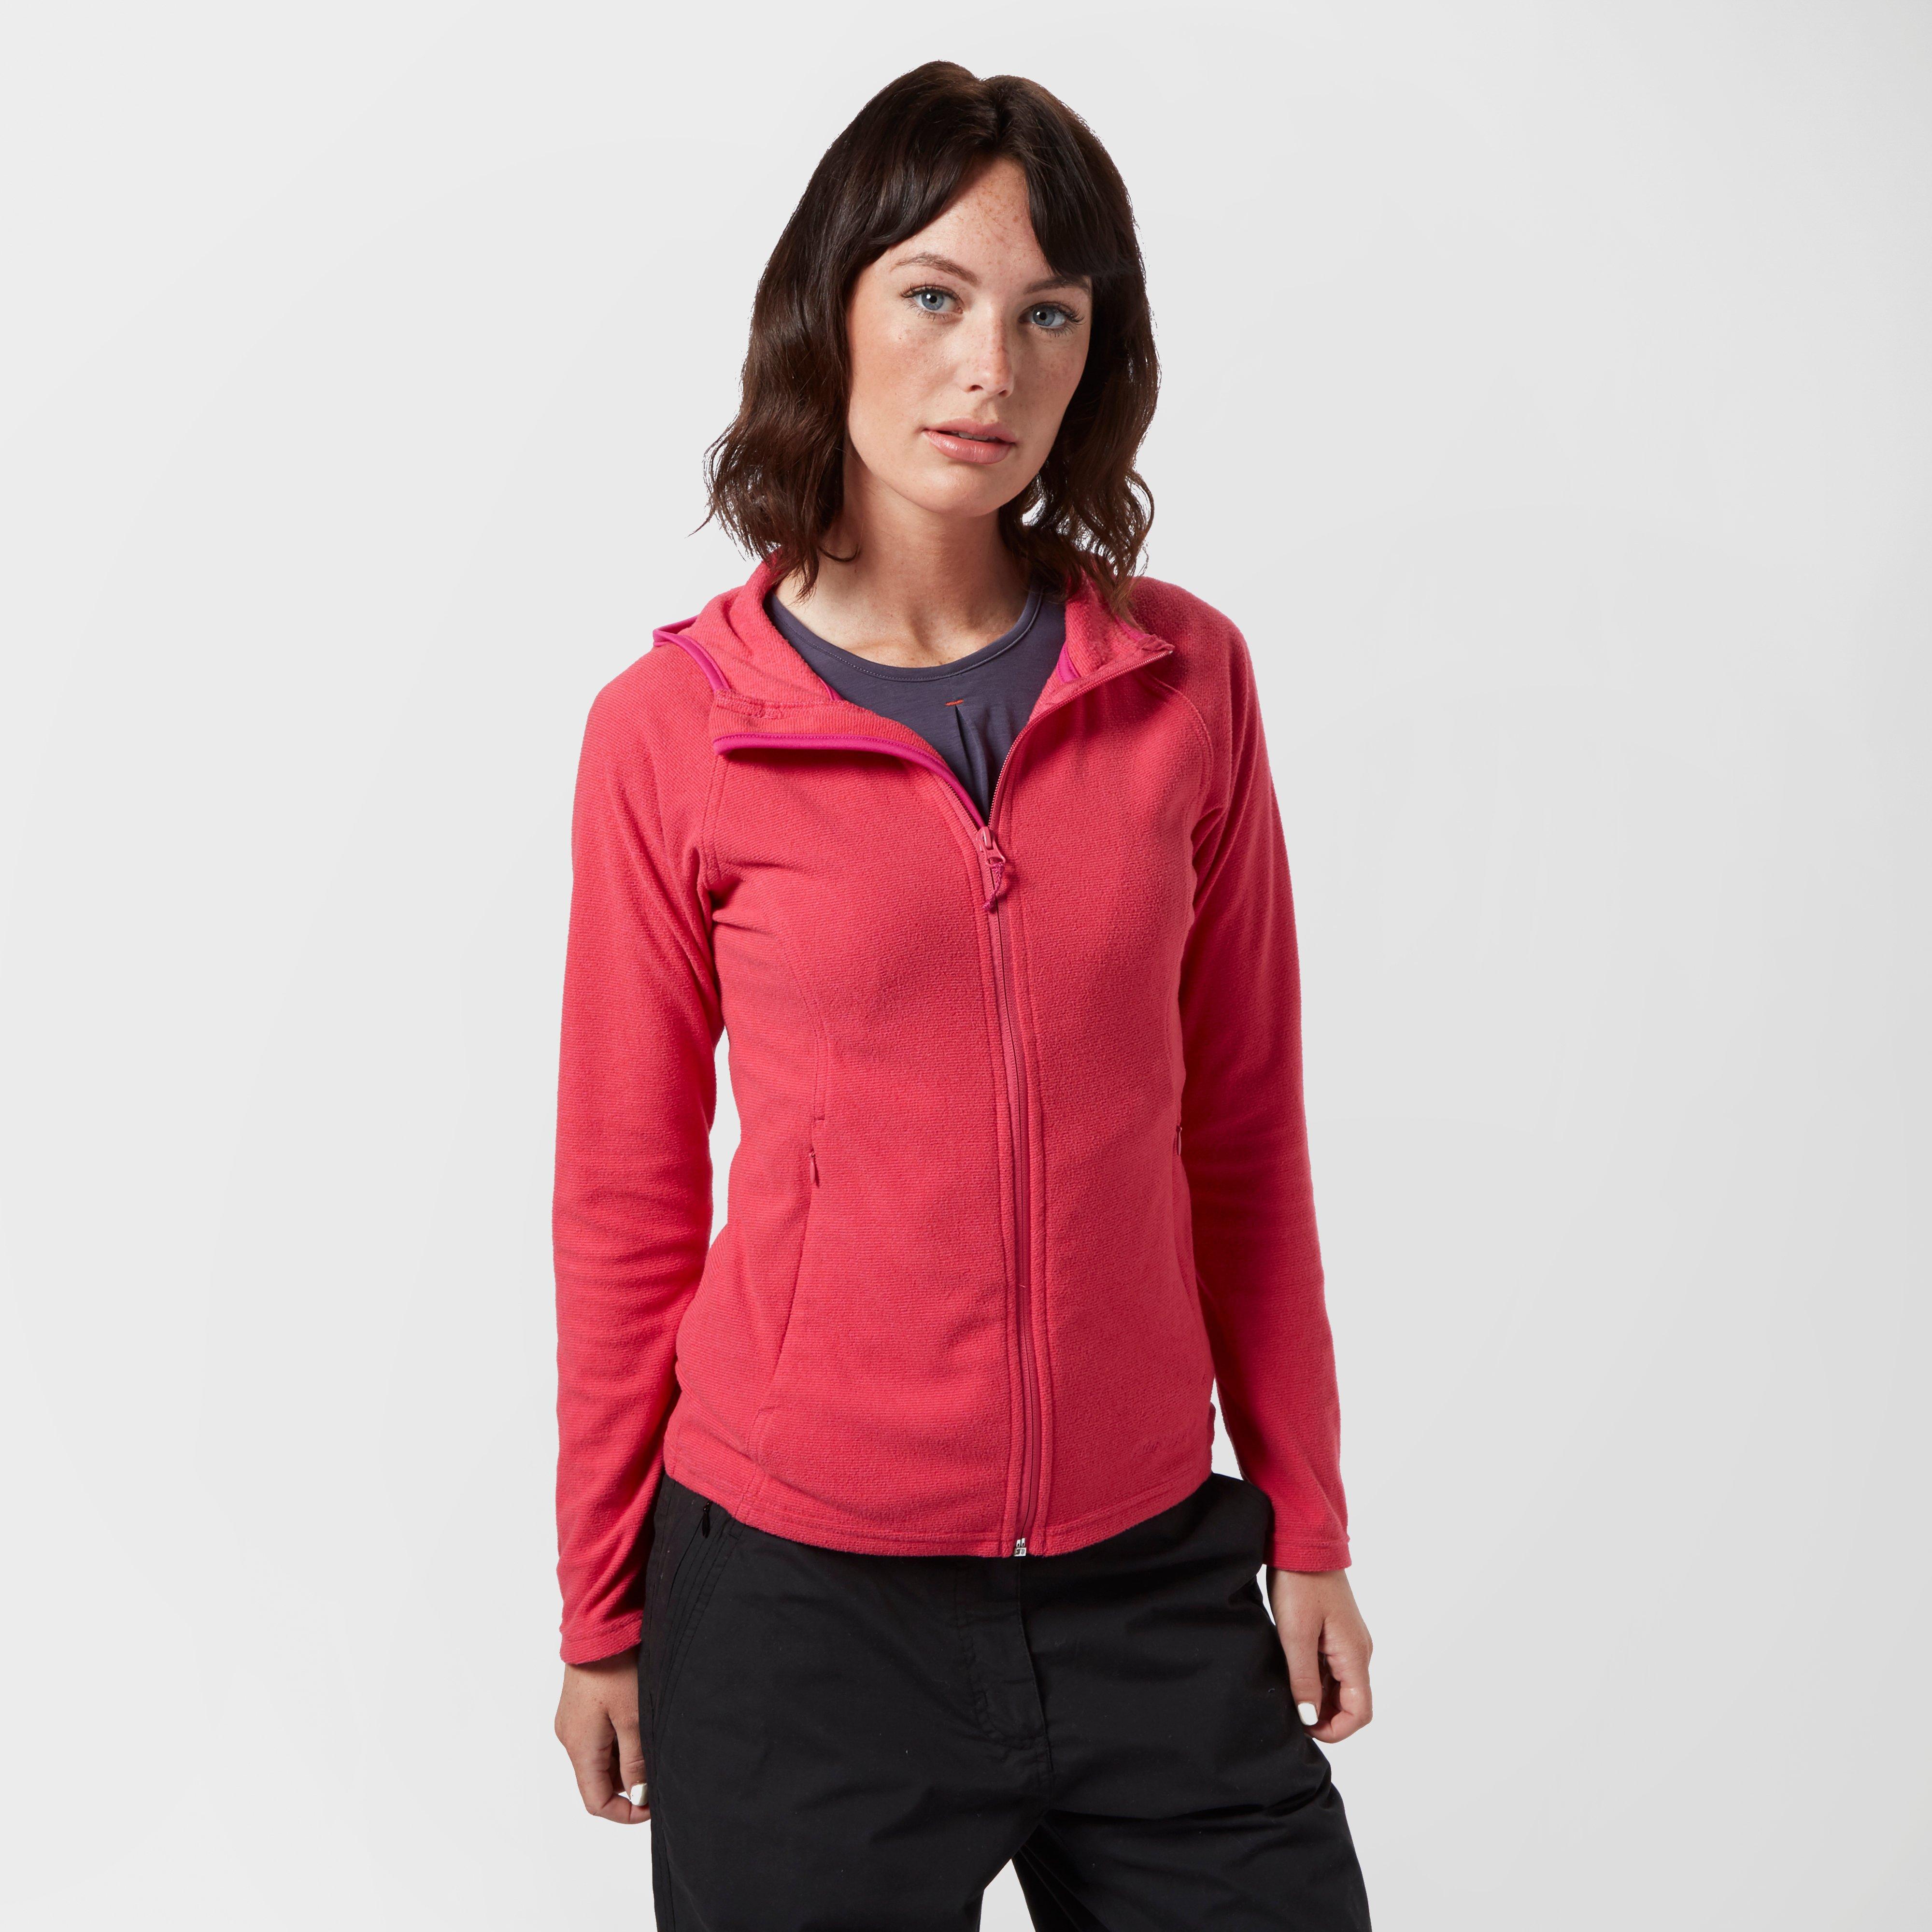 Peter Storm Womens Micro Striped Fleece Hoody Pink